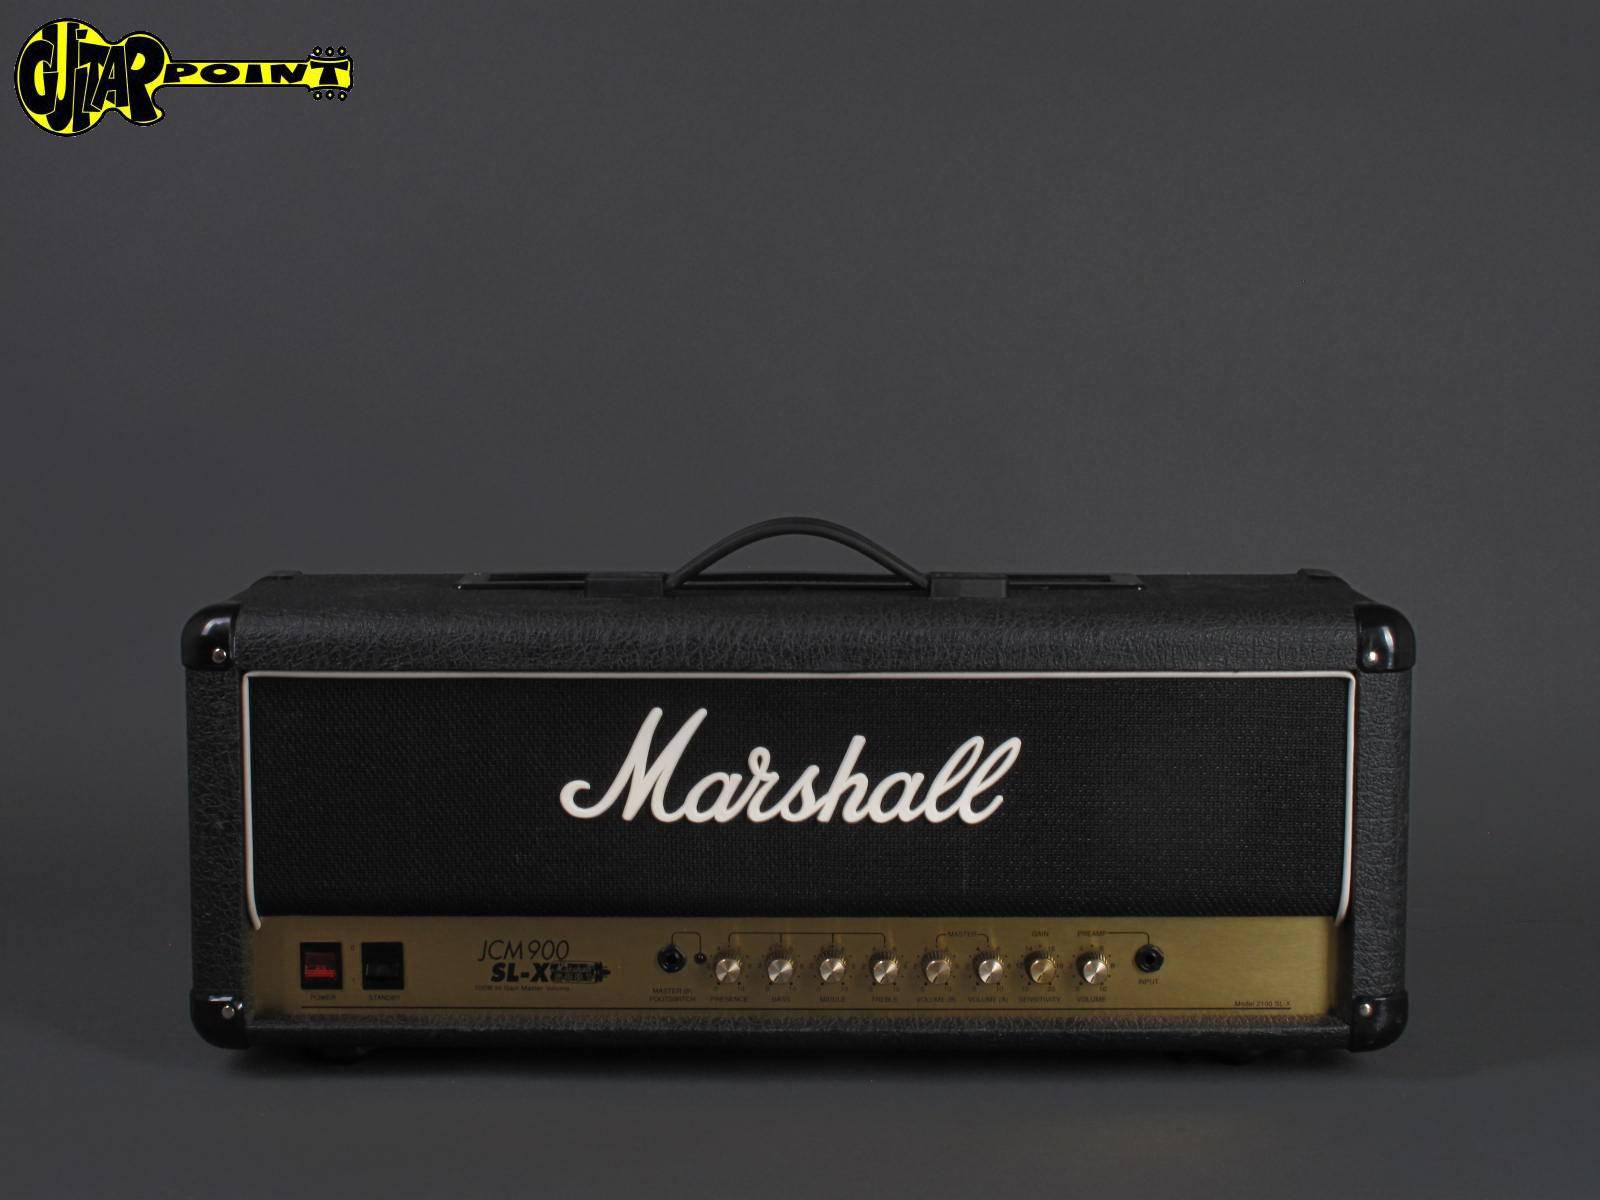 1995 Marshall JCM900 HiGain SL-X 2100 - 100 Watt